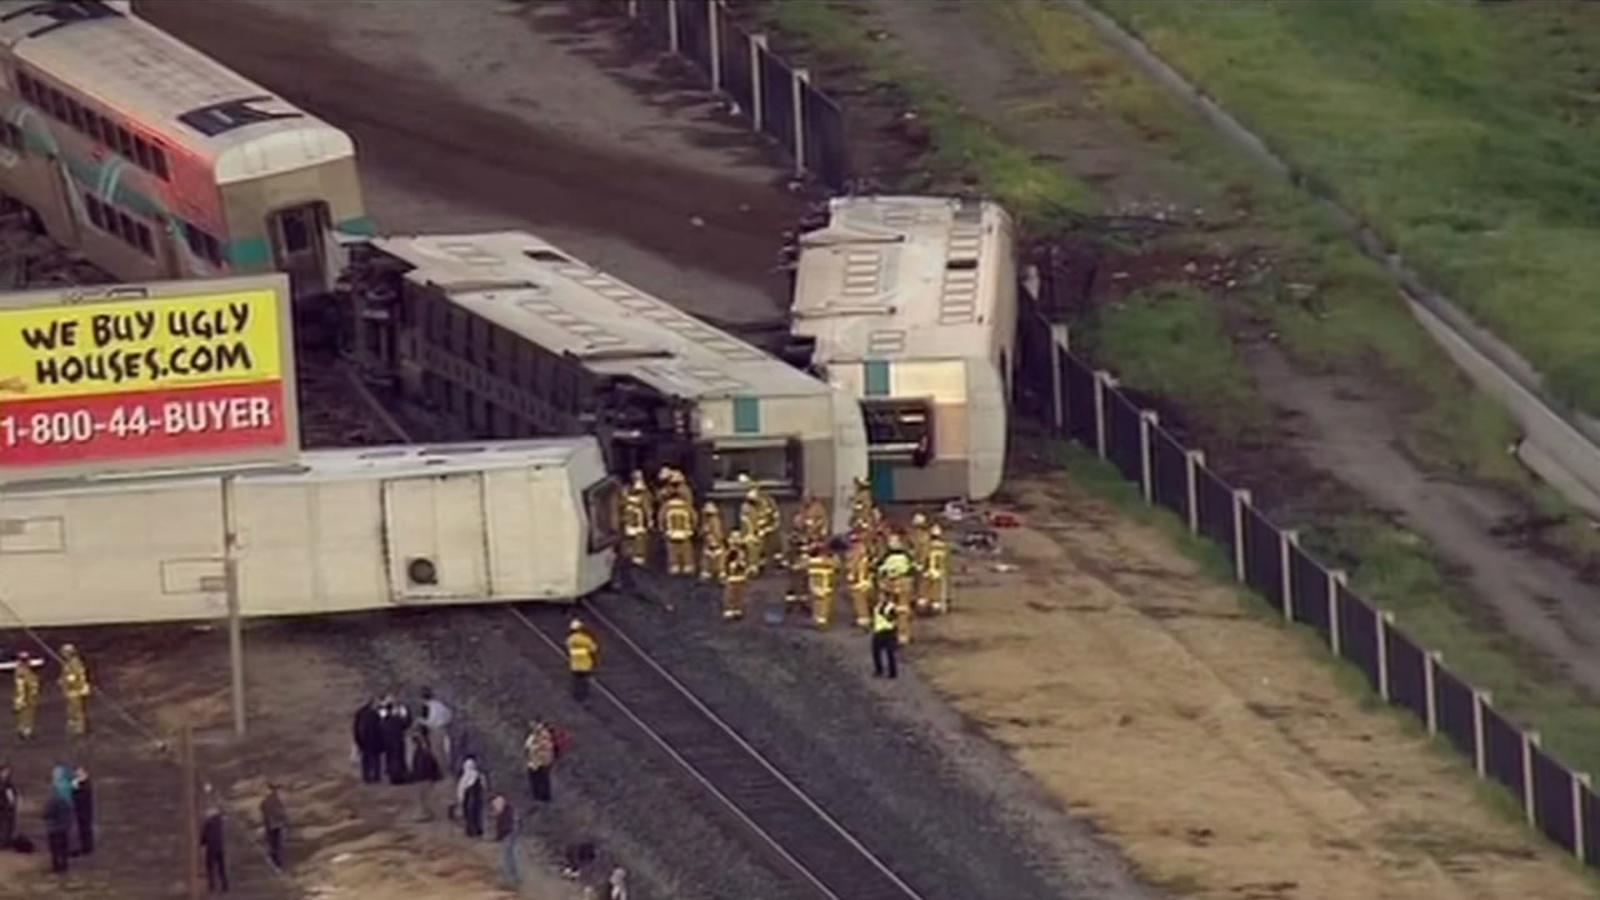 Metrolink Train Slams Into Truck In Oxnard Driver Arrested For